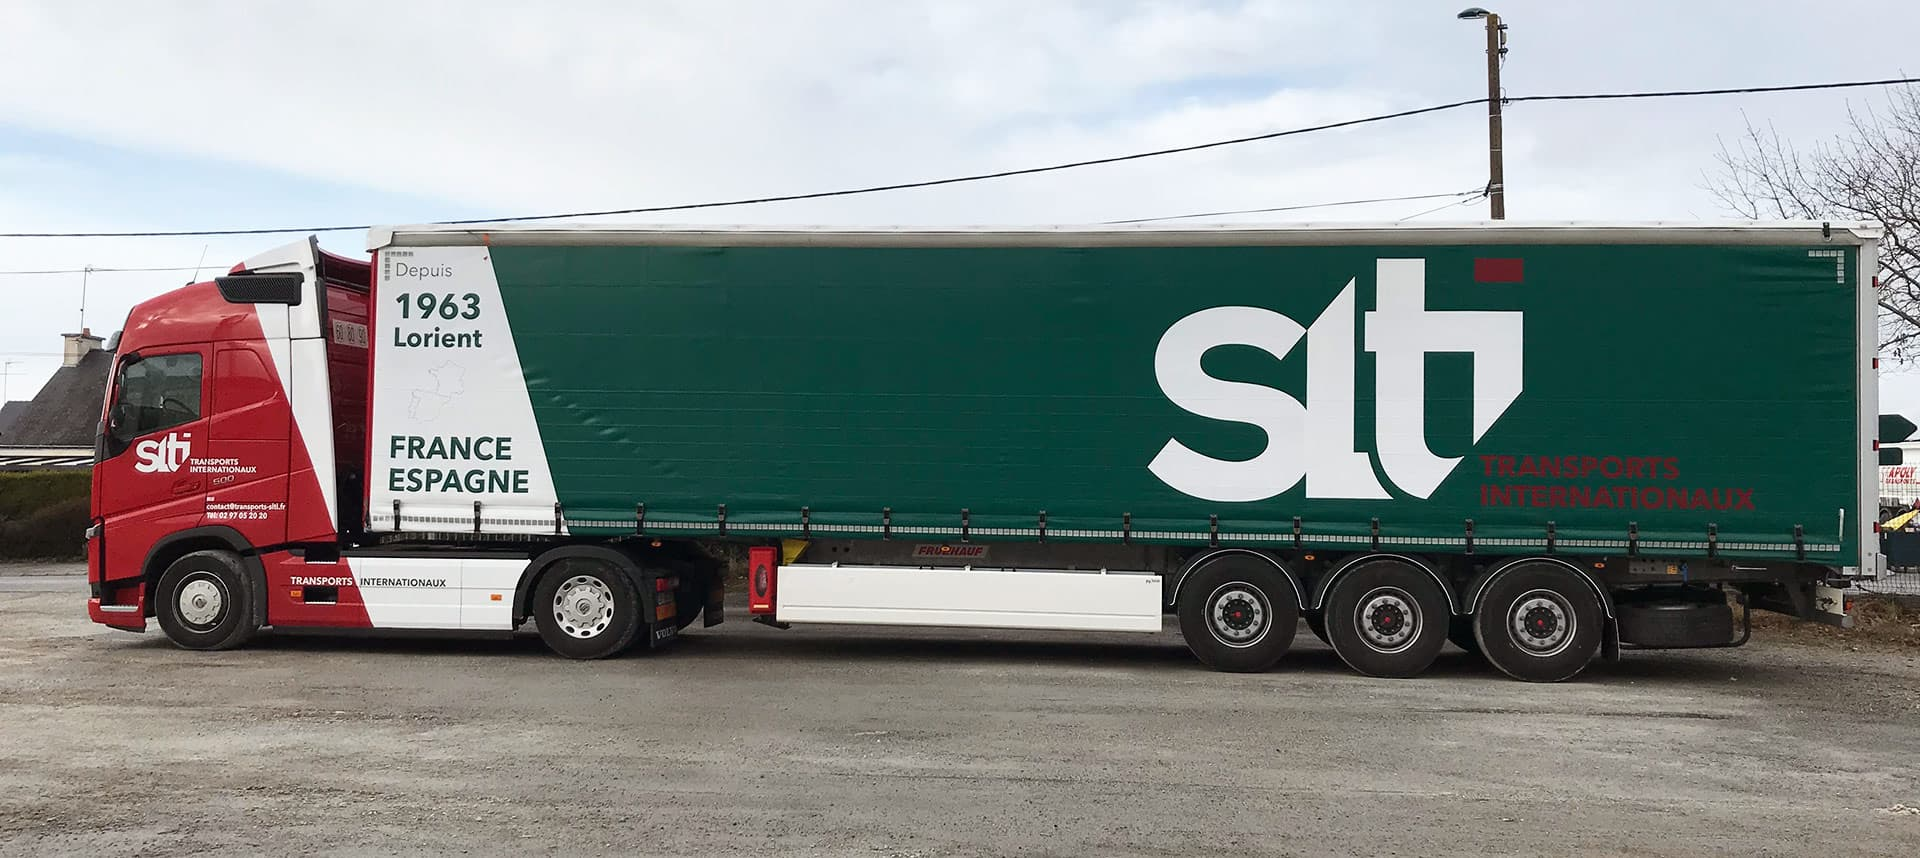 Camion SLTI-Transports